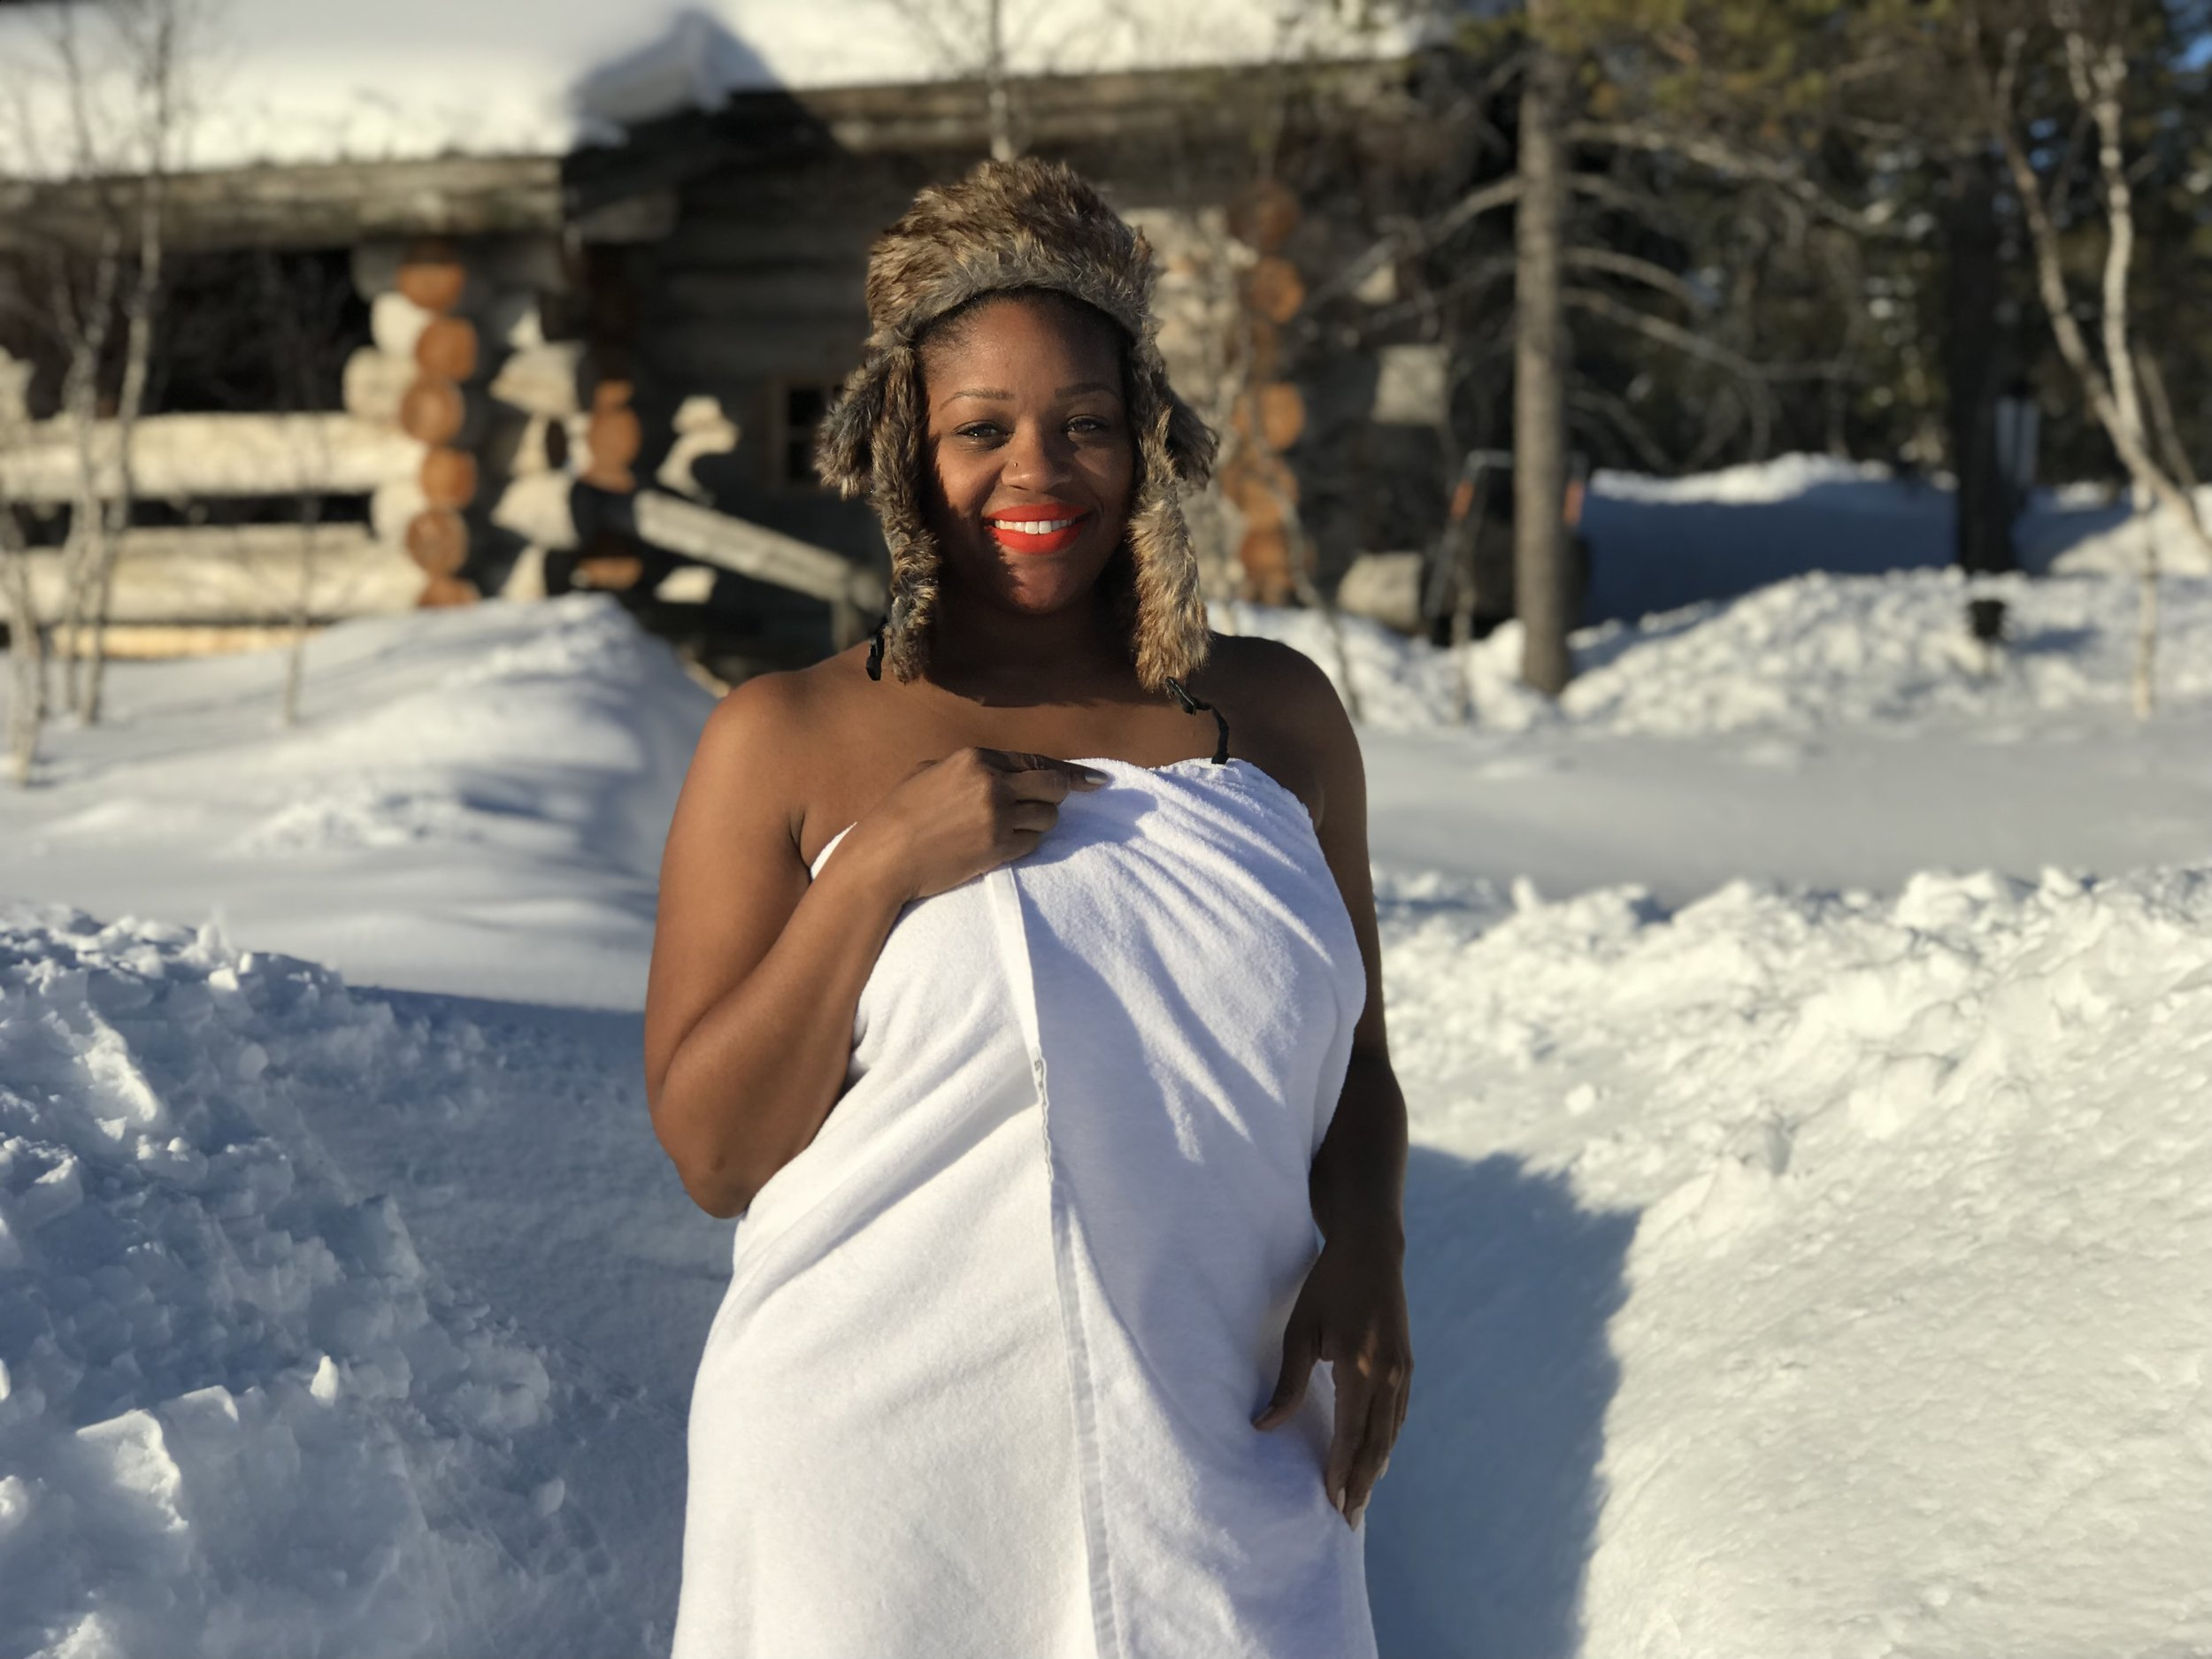 What to Do In The Arctic Circle of Finland - kakslaurrenanen Arctic Resort - Smoke Sauna and Ice Pool - RachelTravels.com